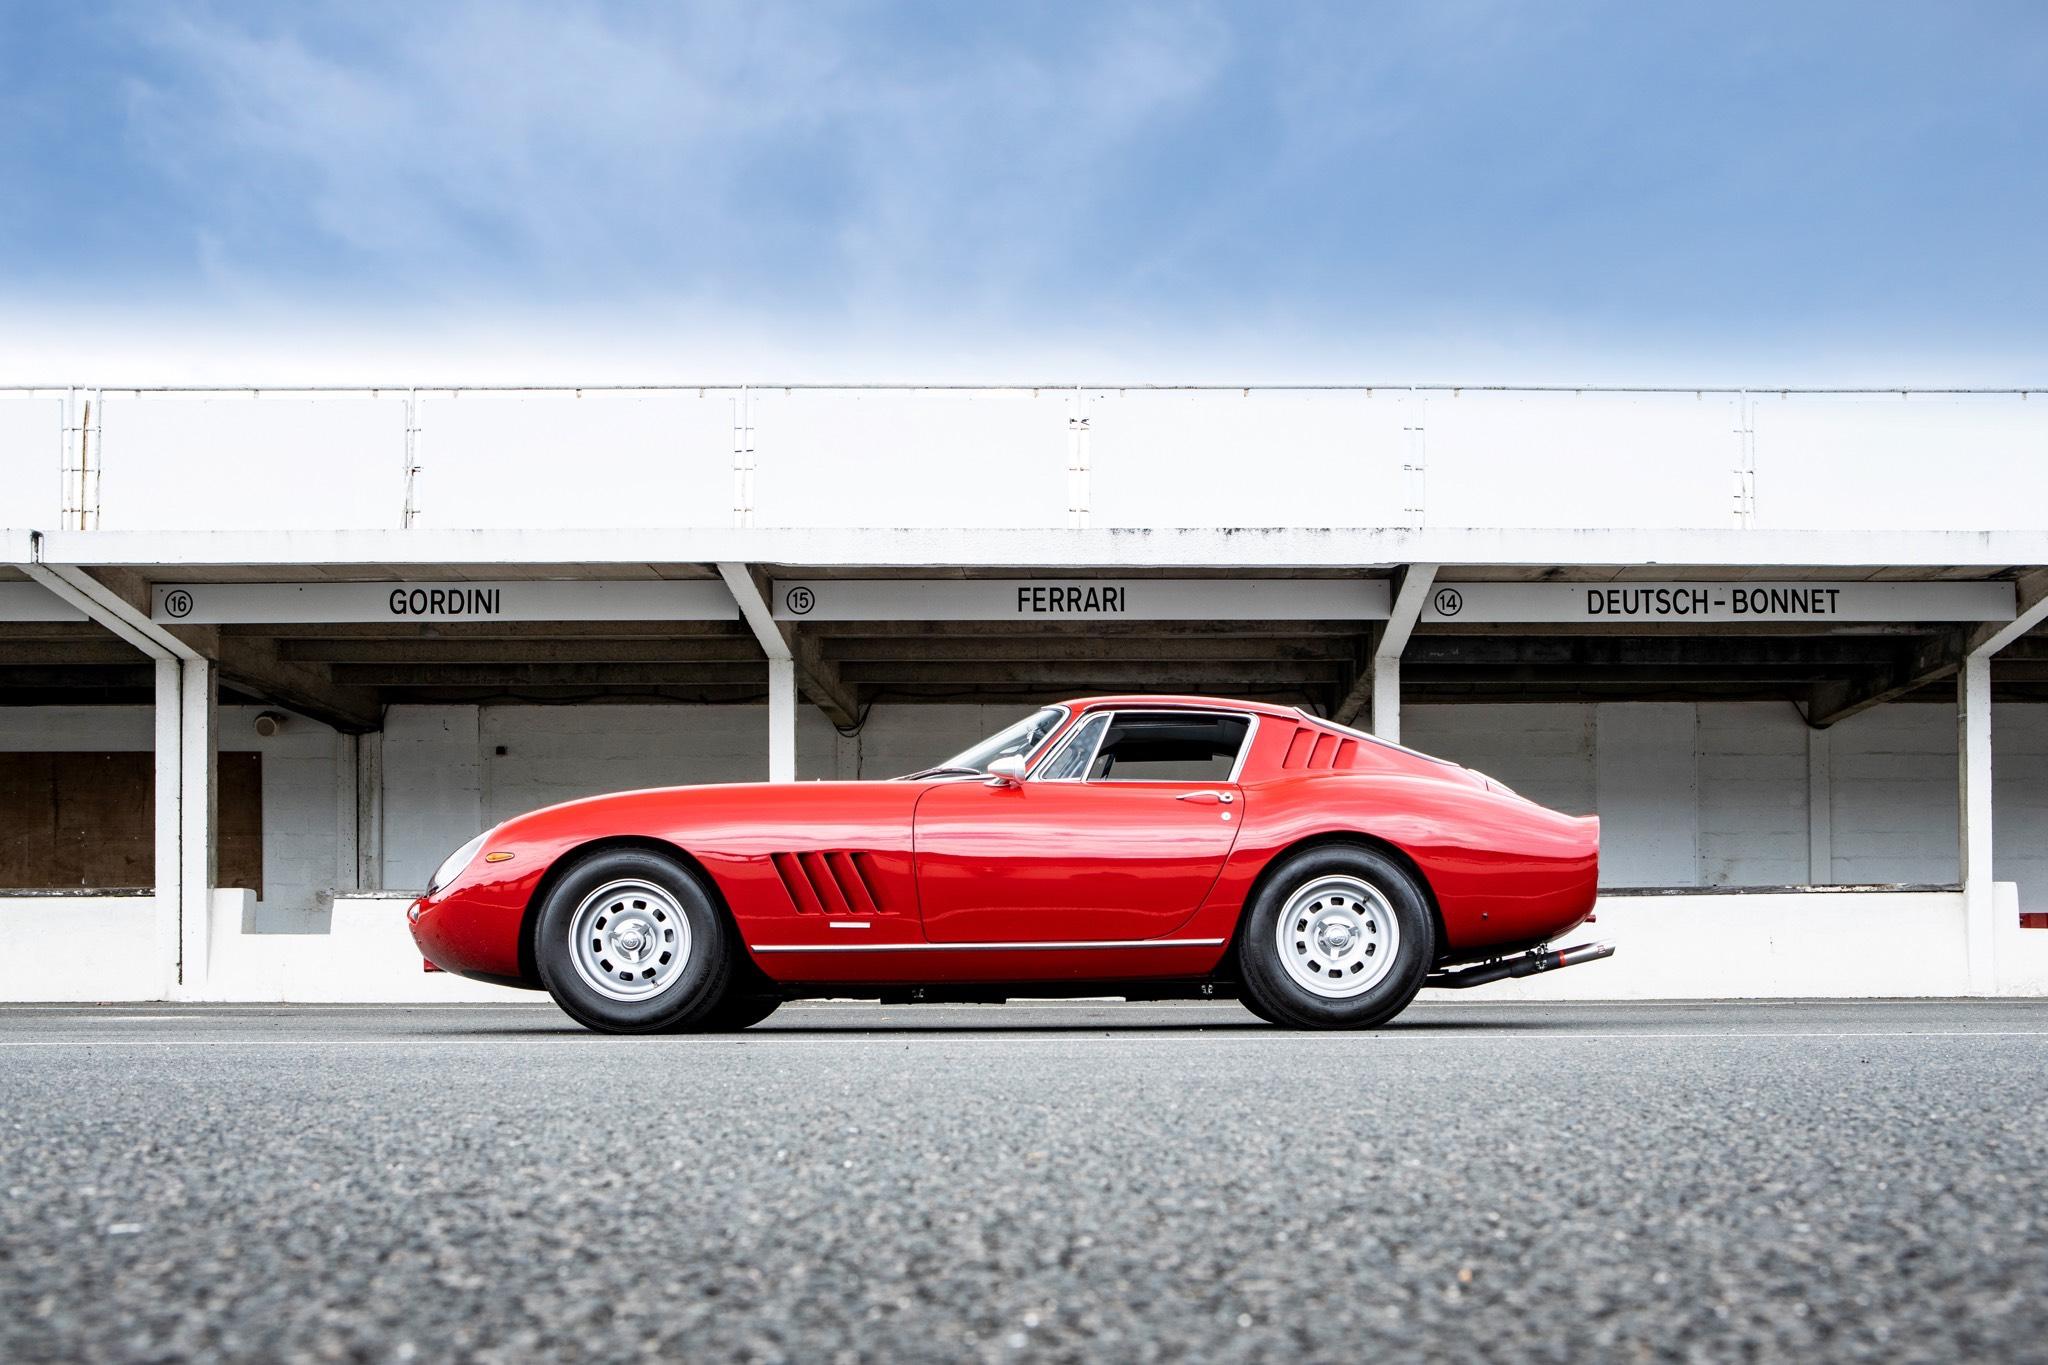 1965 Ferrari 275 GTB Alloy Long-Nose - R - M1.jpg